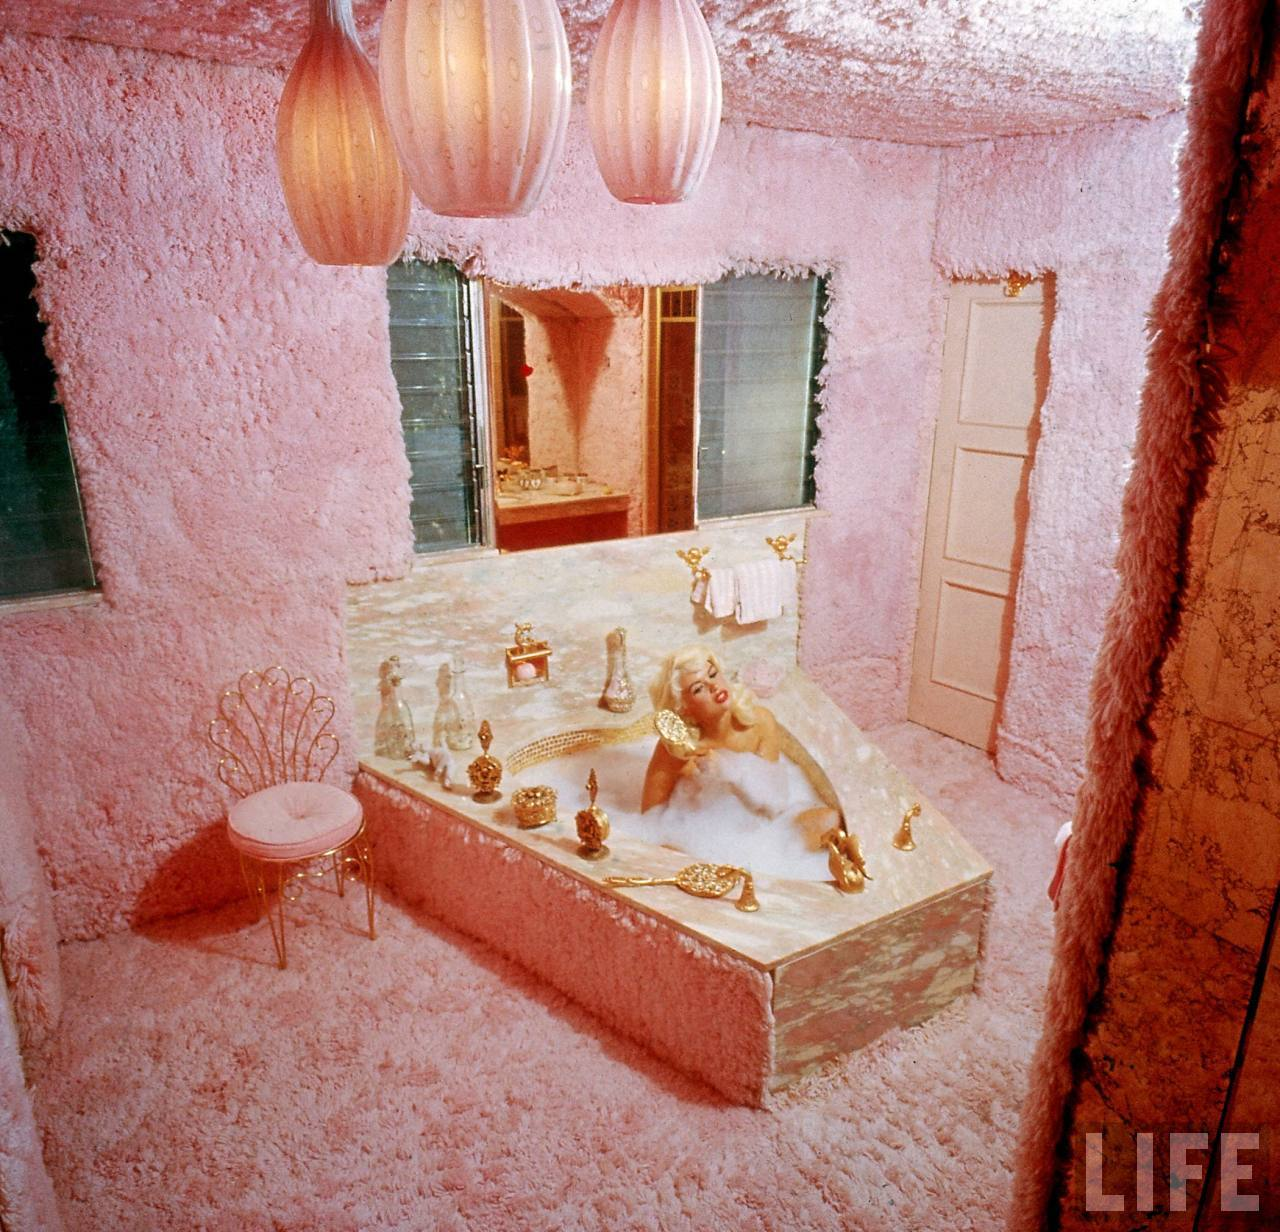 60 S Sex Symbol Jayne Mansfield Amp Her Hot Pink Beverly